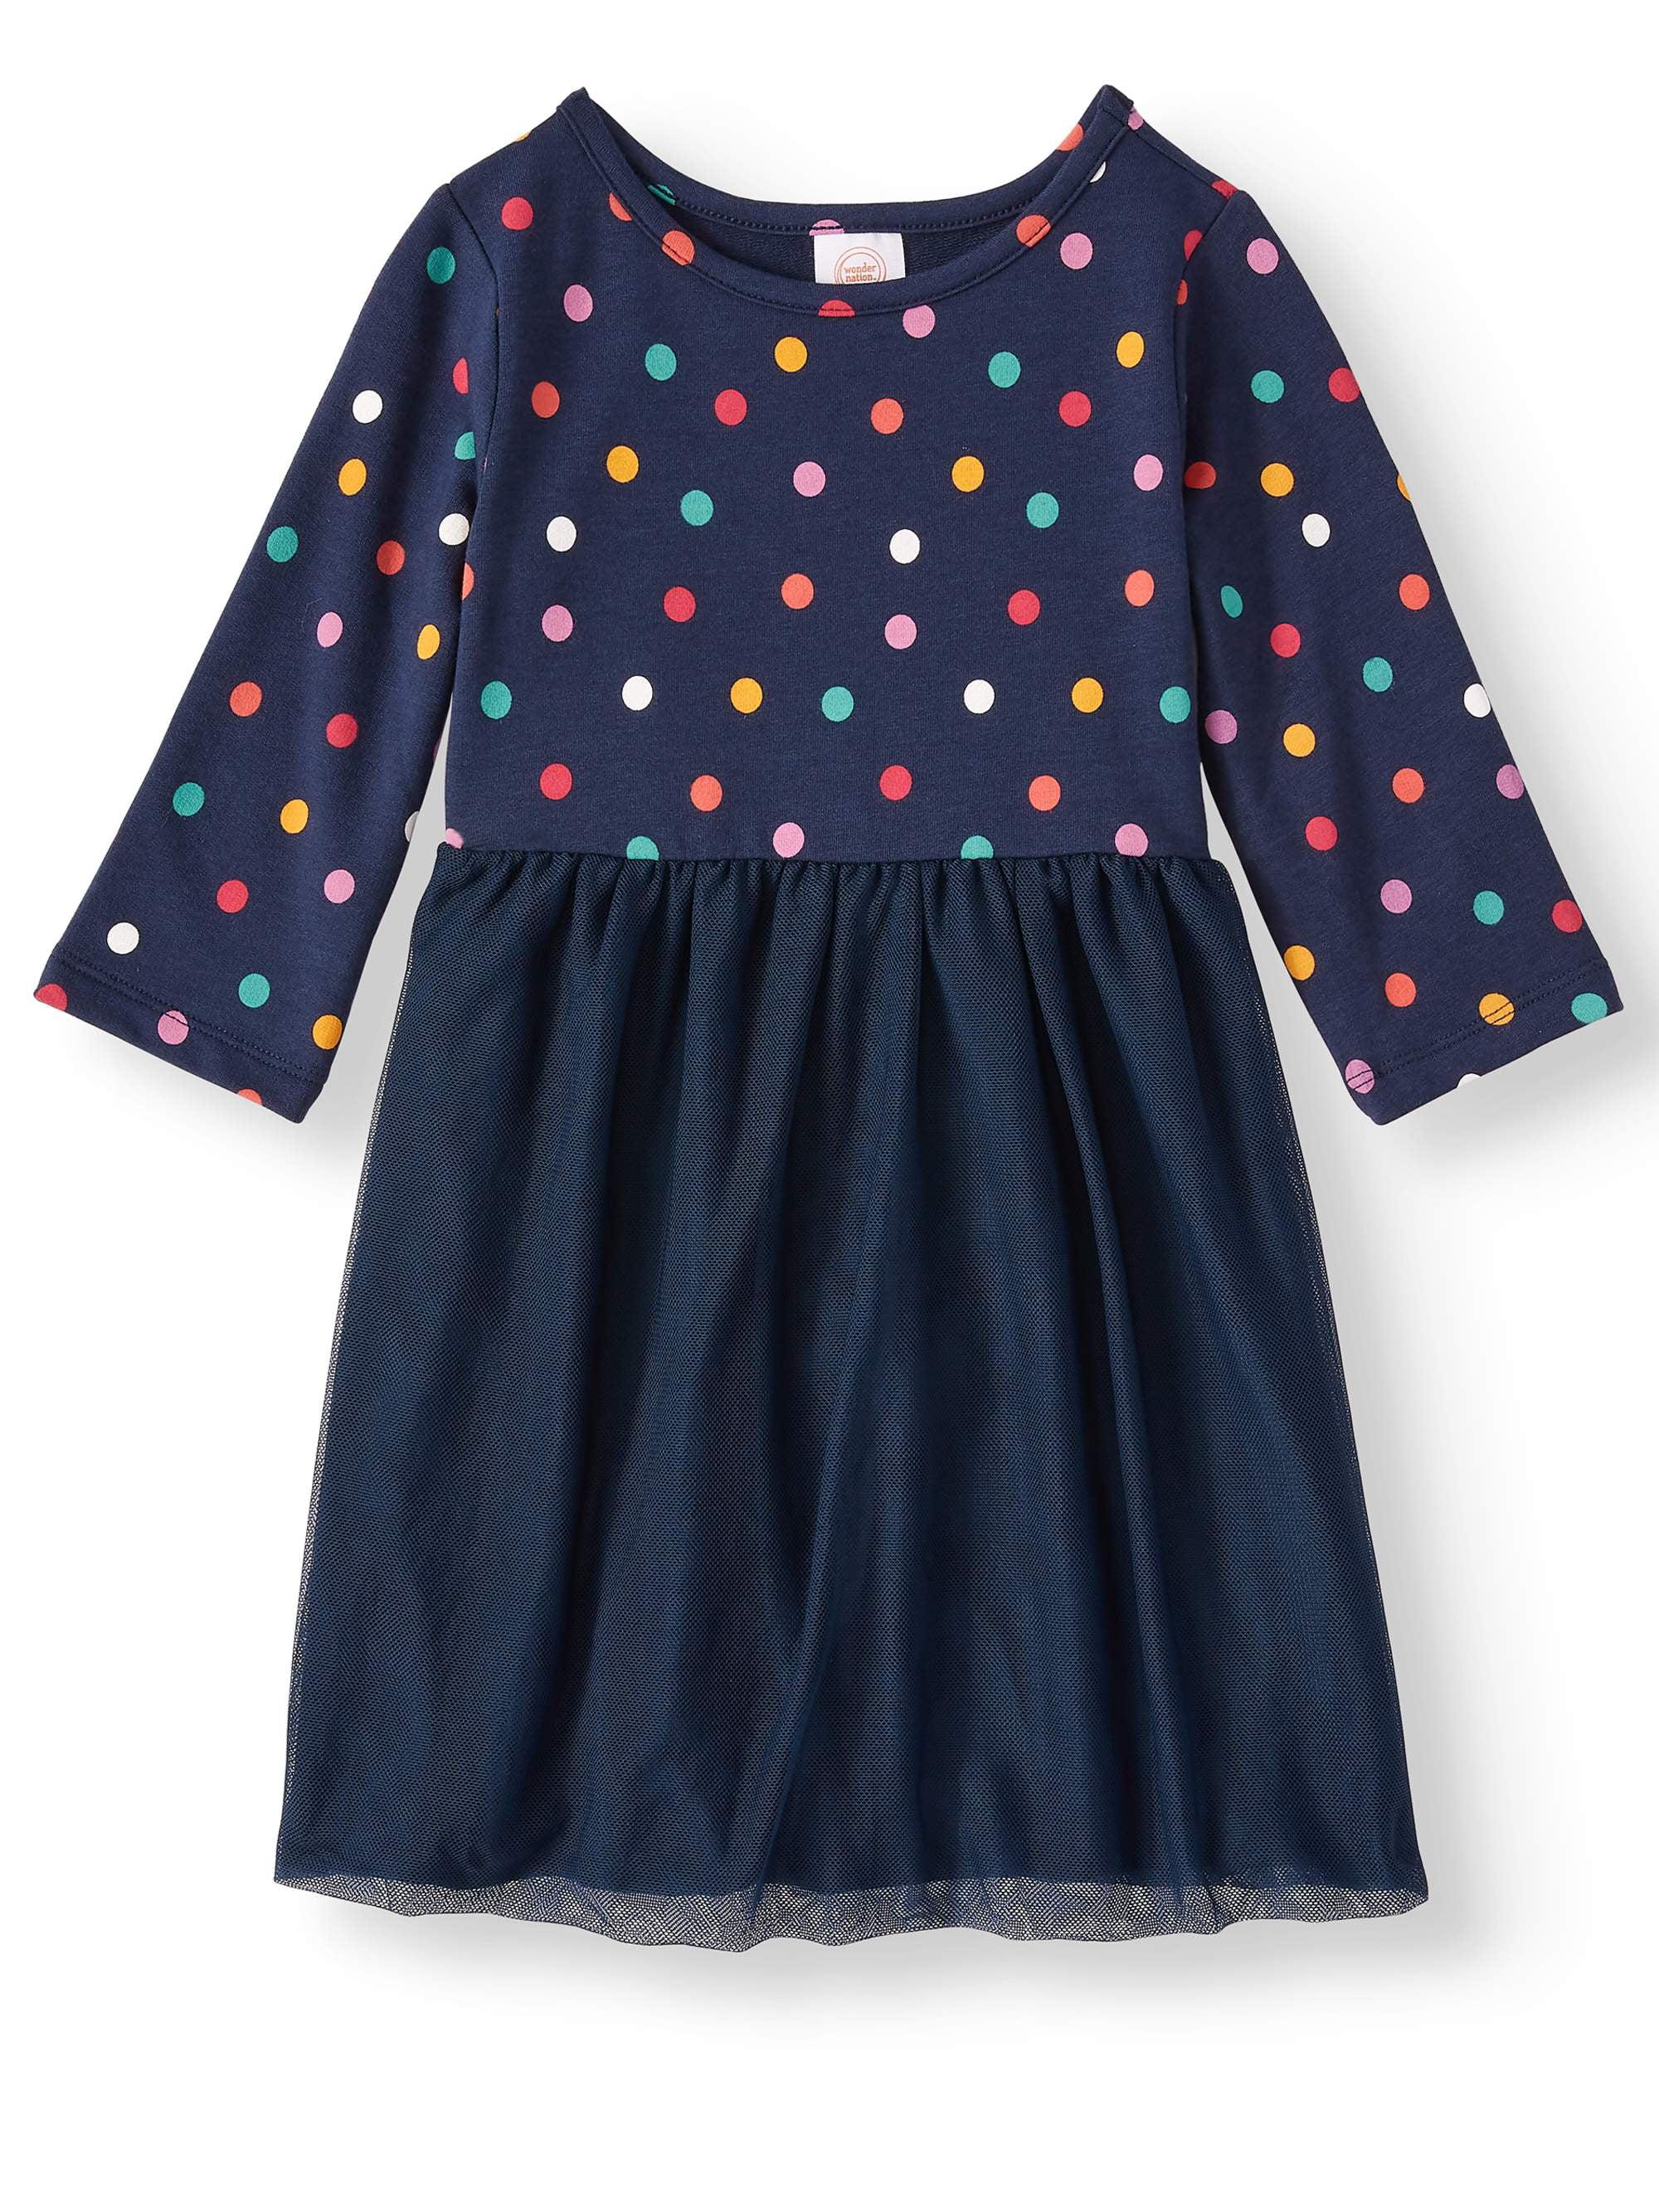 EGG BY SUSAN LAZAR Toddler Girl/'s Plum Classic Knit Dress W3CK648T $70 NEW